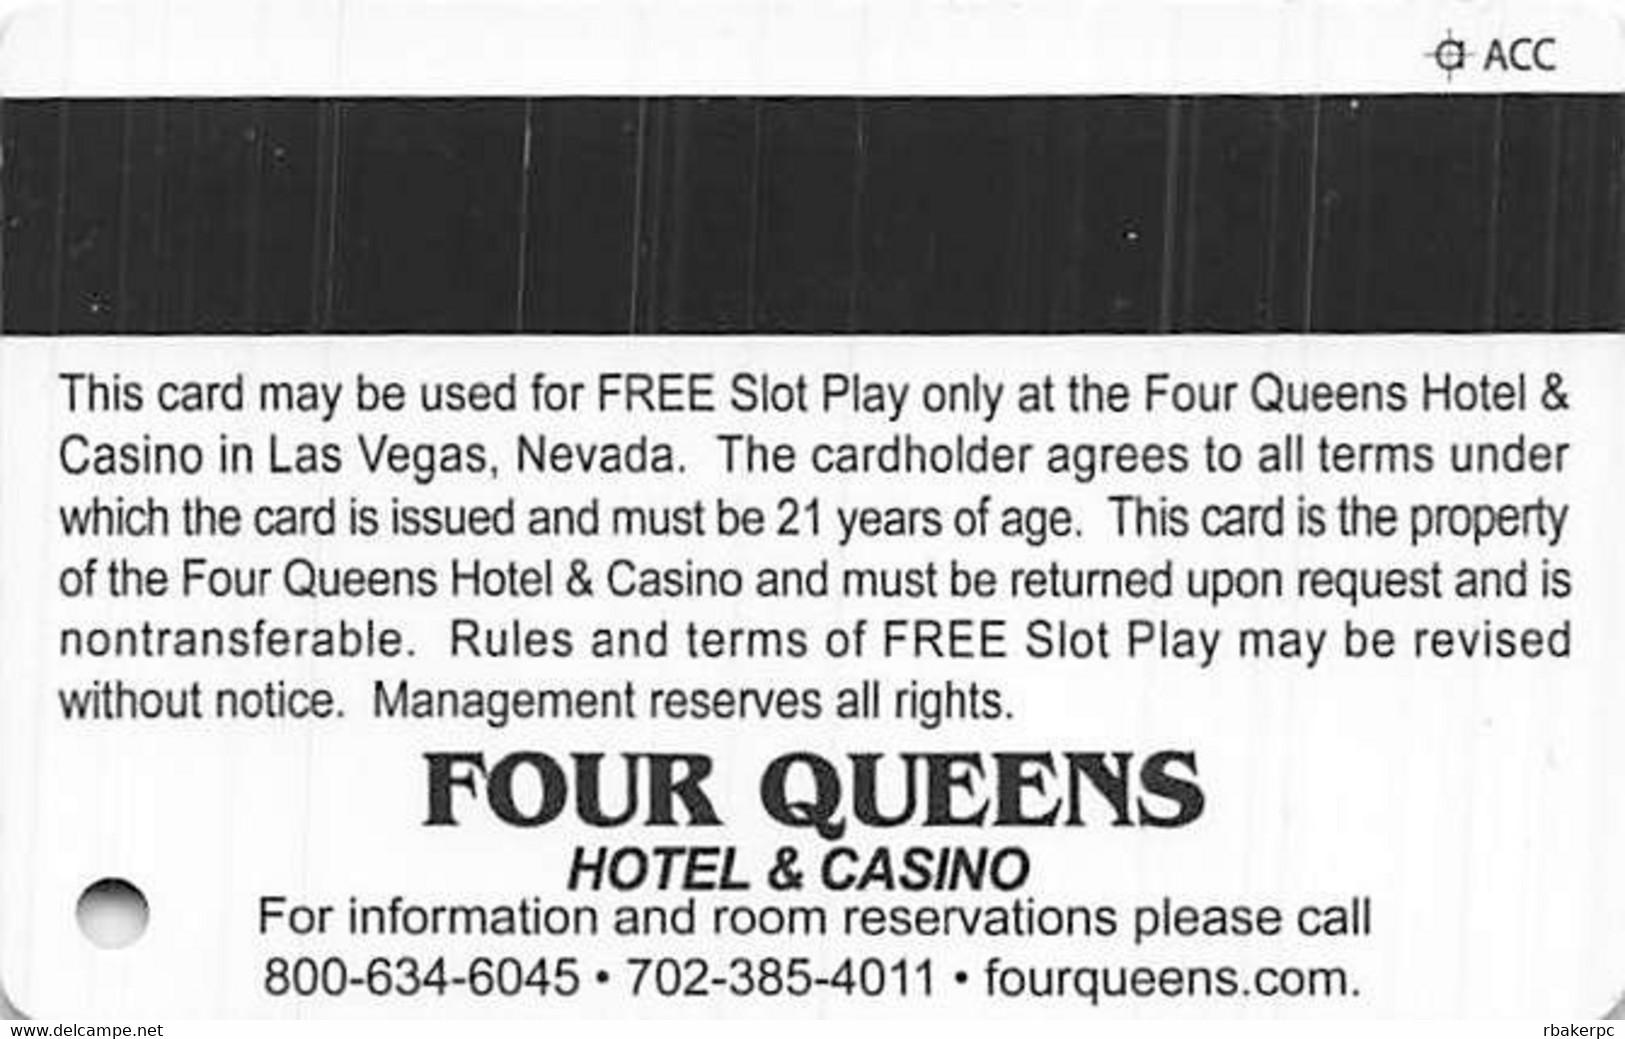 Four Queens Casino Las Vegas, NV - $50 Slot Play Card - ACC Over Mag Stripe - Casino Cards